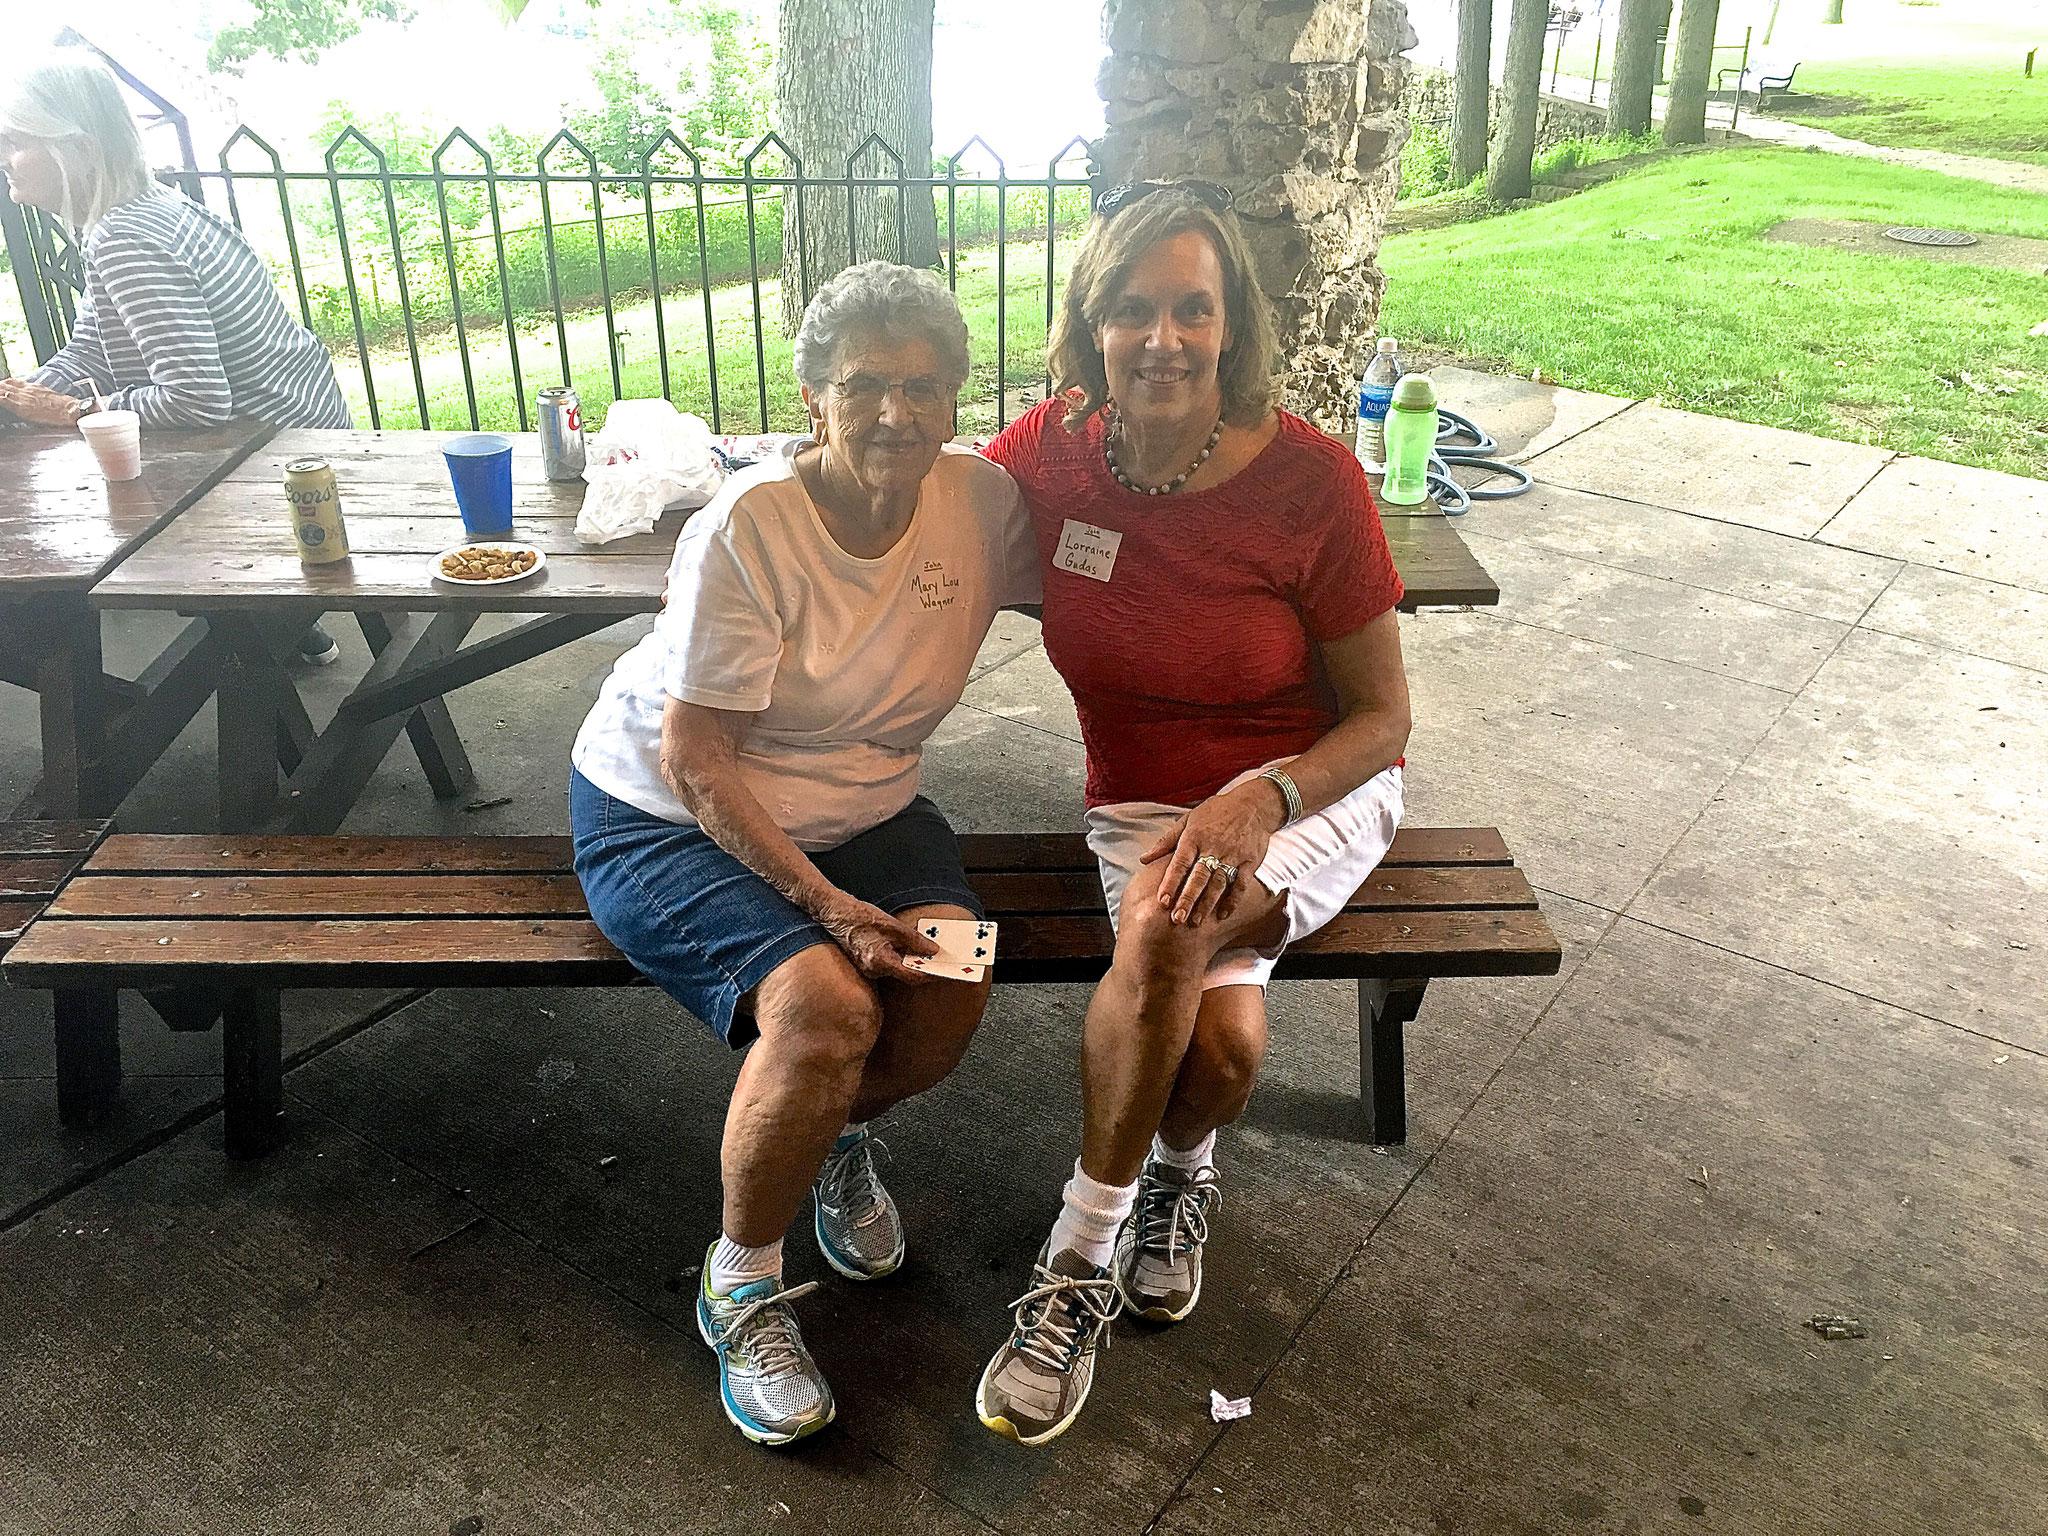 Mary Lou Wagner and Lorrine Gudas